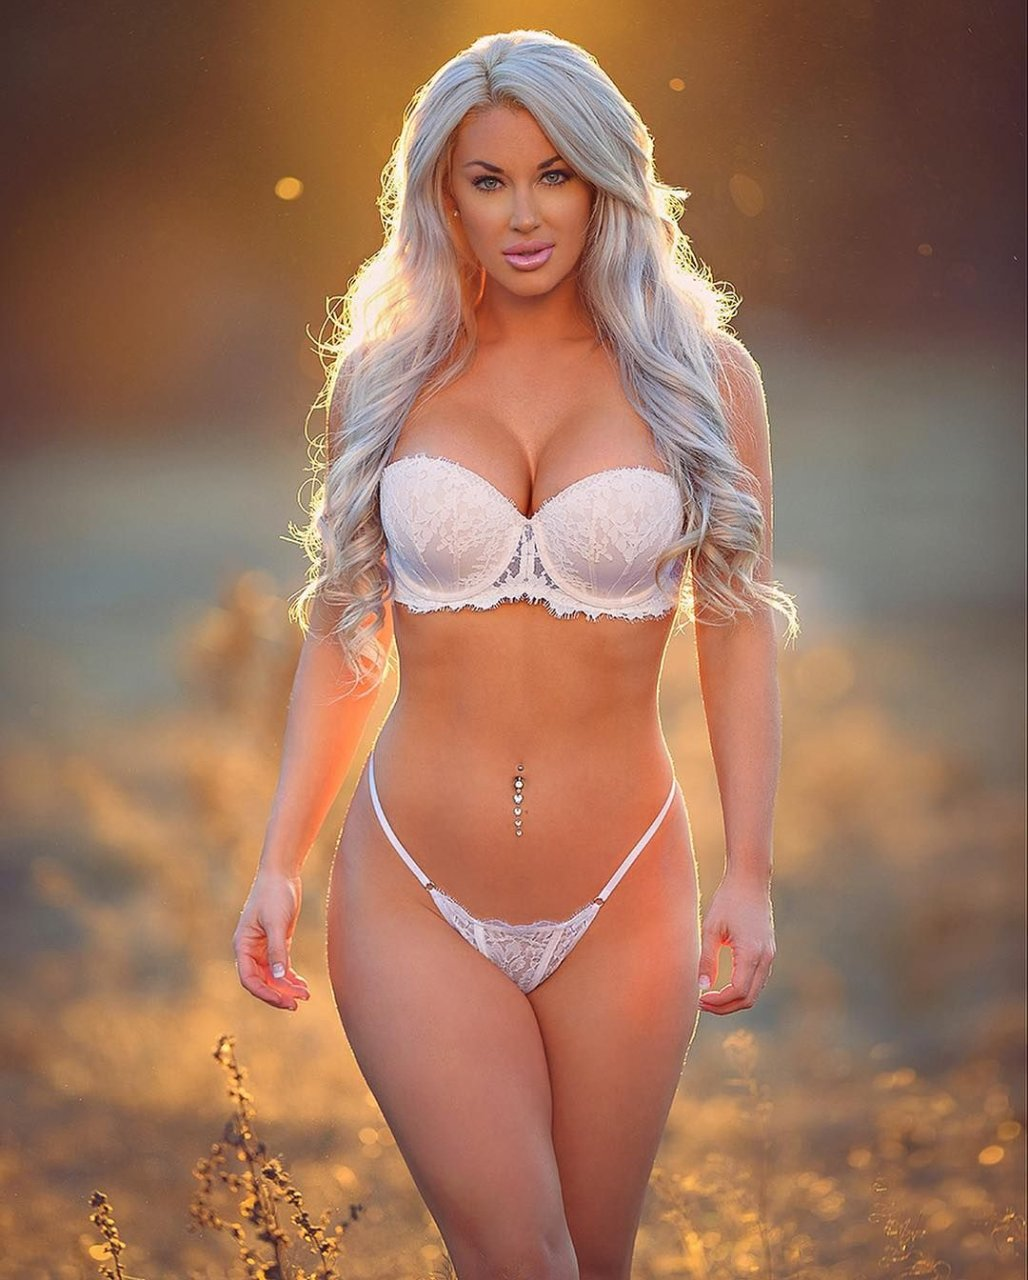 Laci kay somers sexy